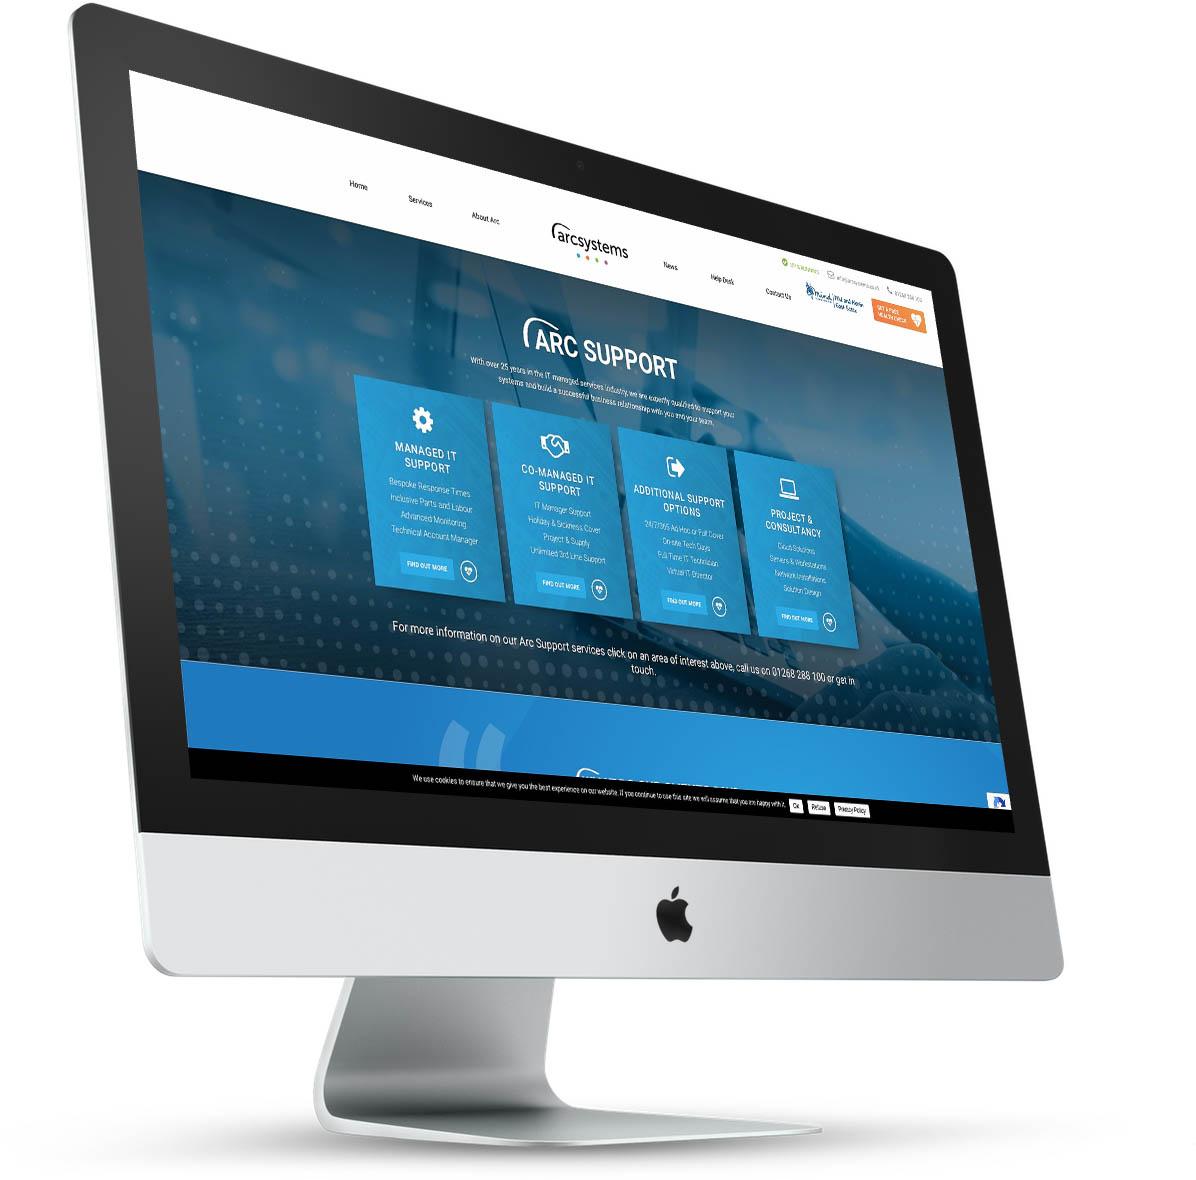 Arc Systems Website Design